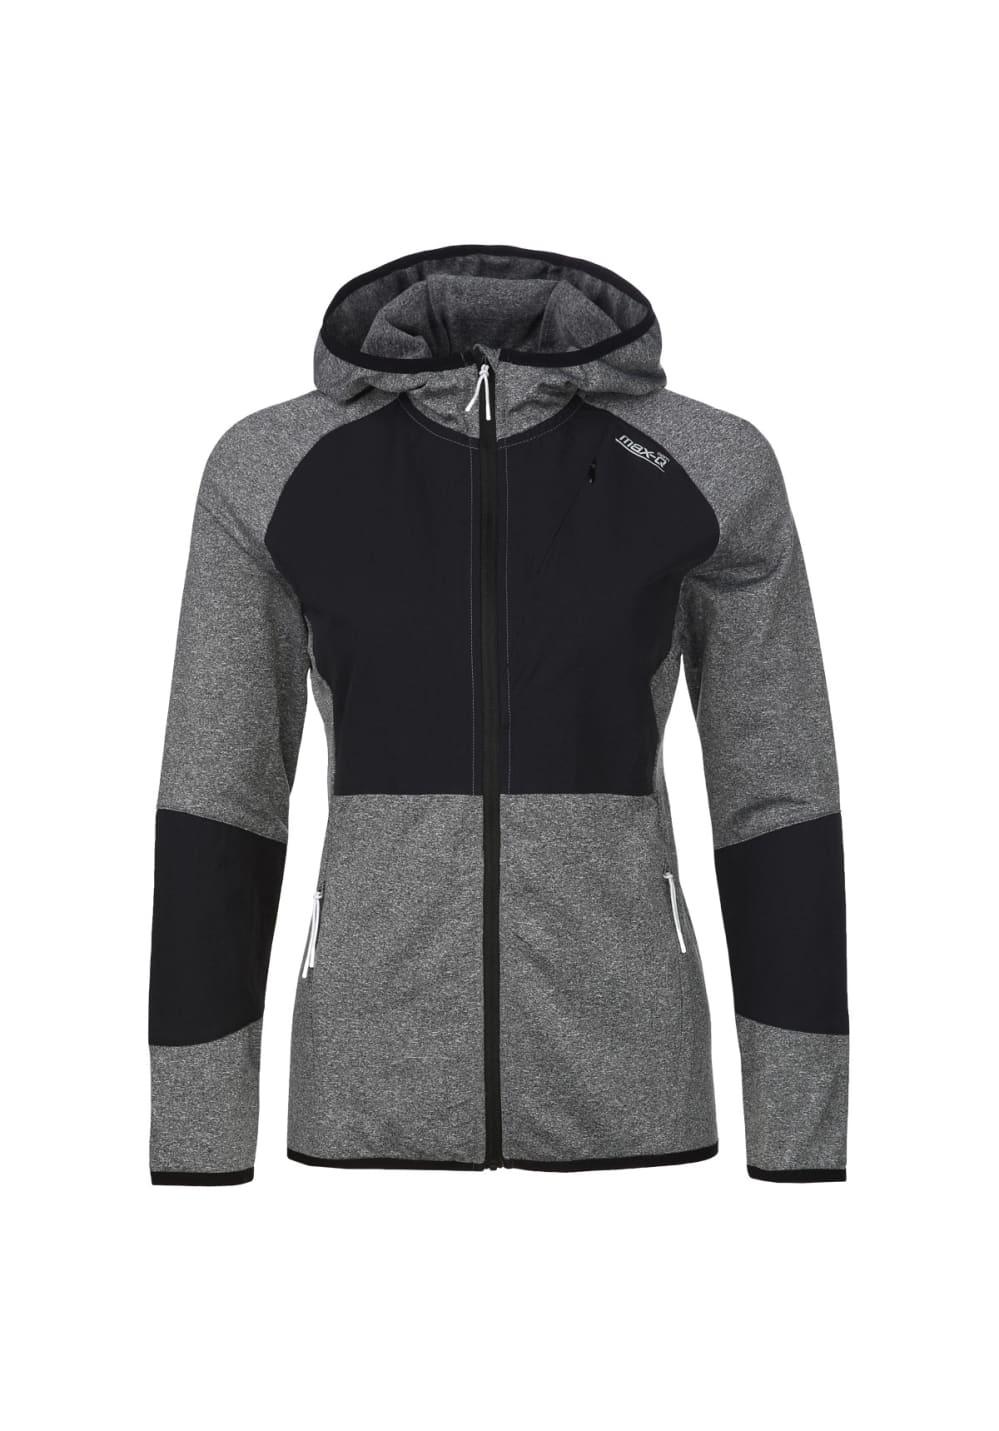 max-Q.com Flexx Hoody Jacket - Laufjacken für Damen - Grau, Gr. L